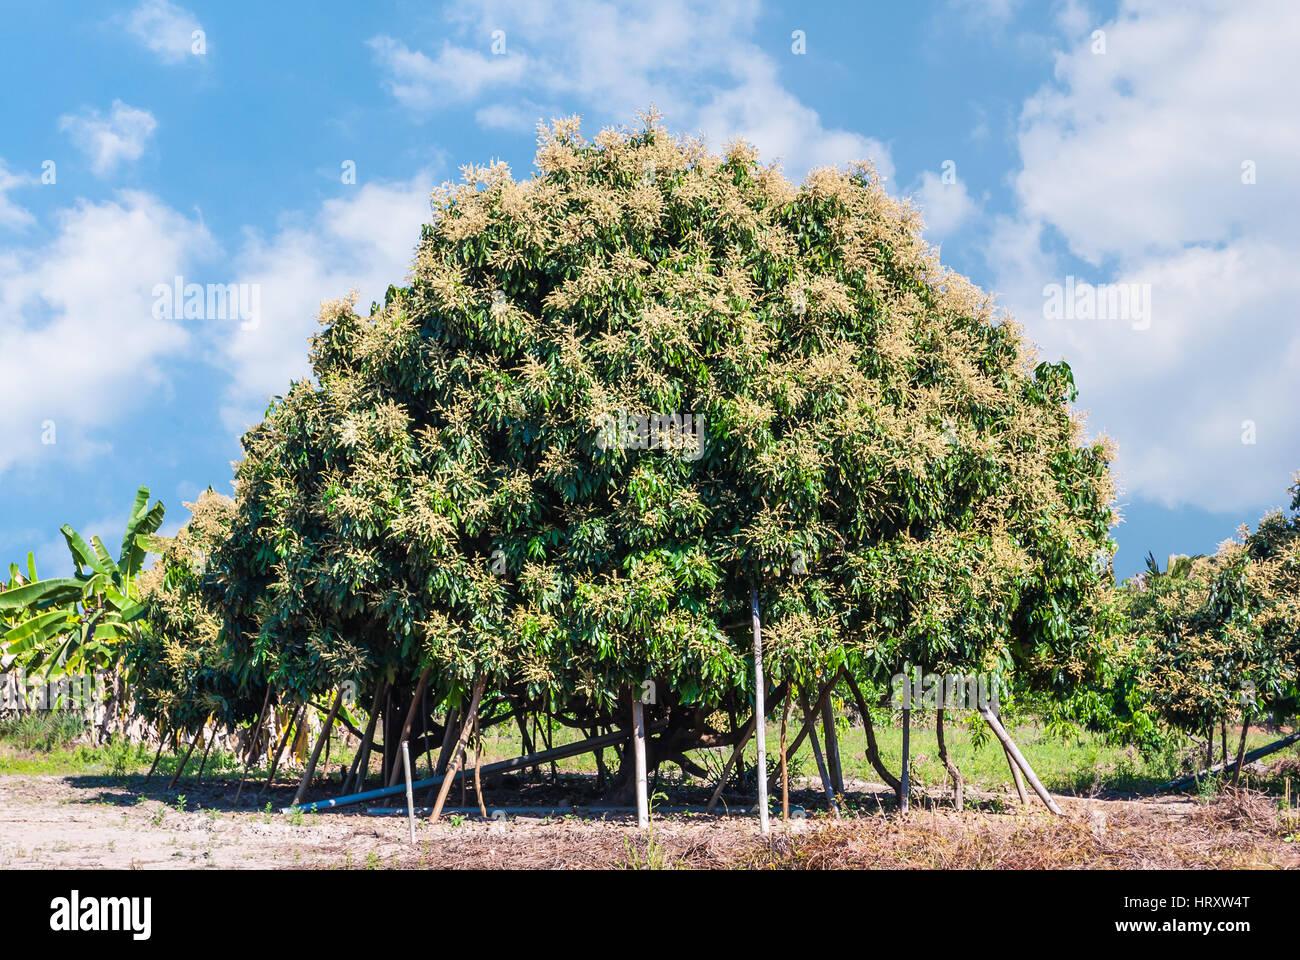 Longan Tree Stock Photos & Longan Tree Stock Images - Alamy